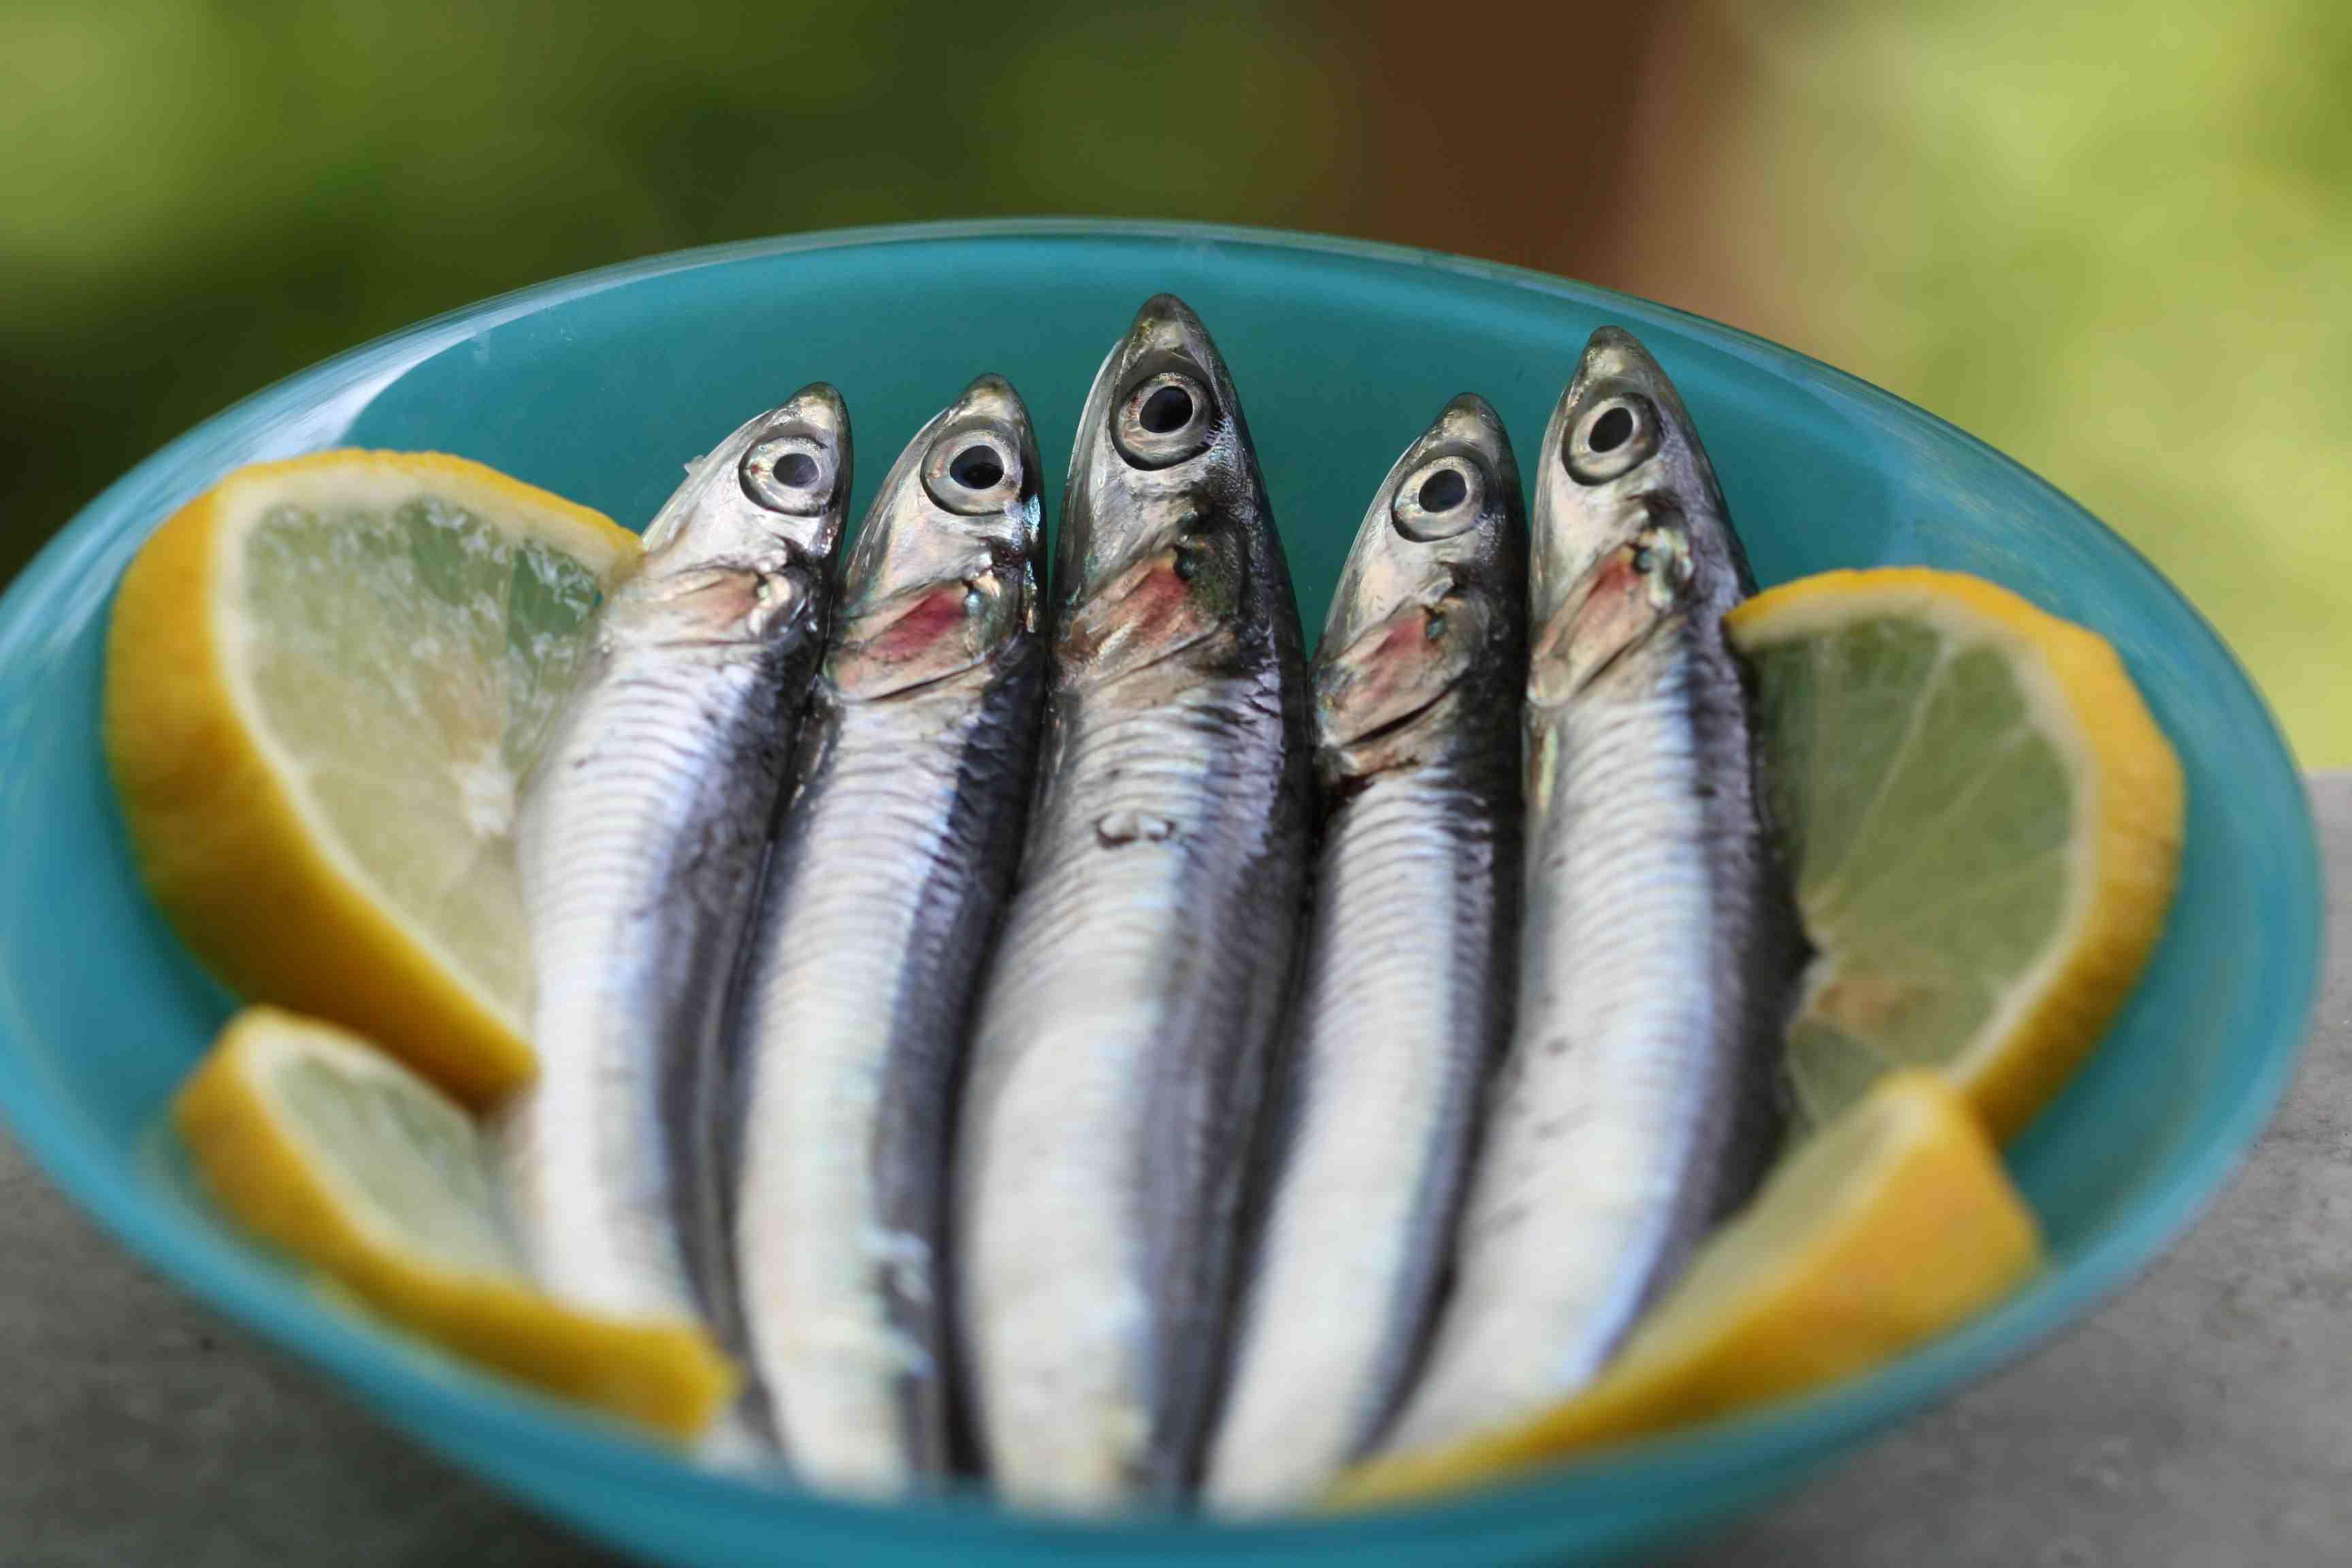 Top 8 Fish for Omega-3 Fatty Acids